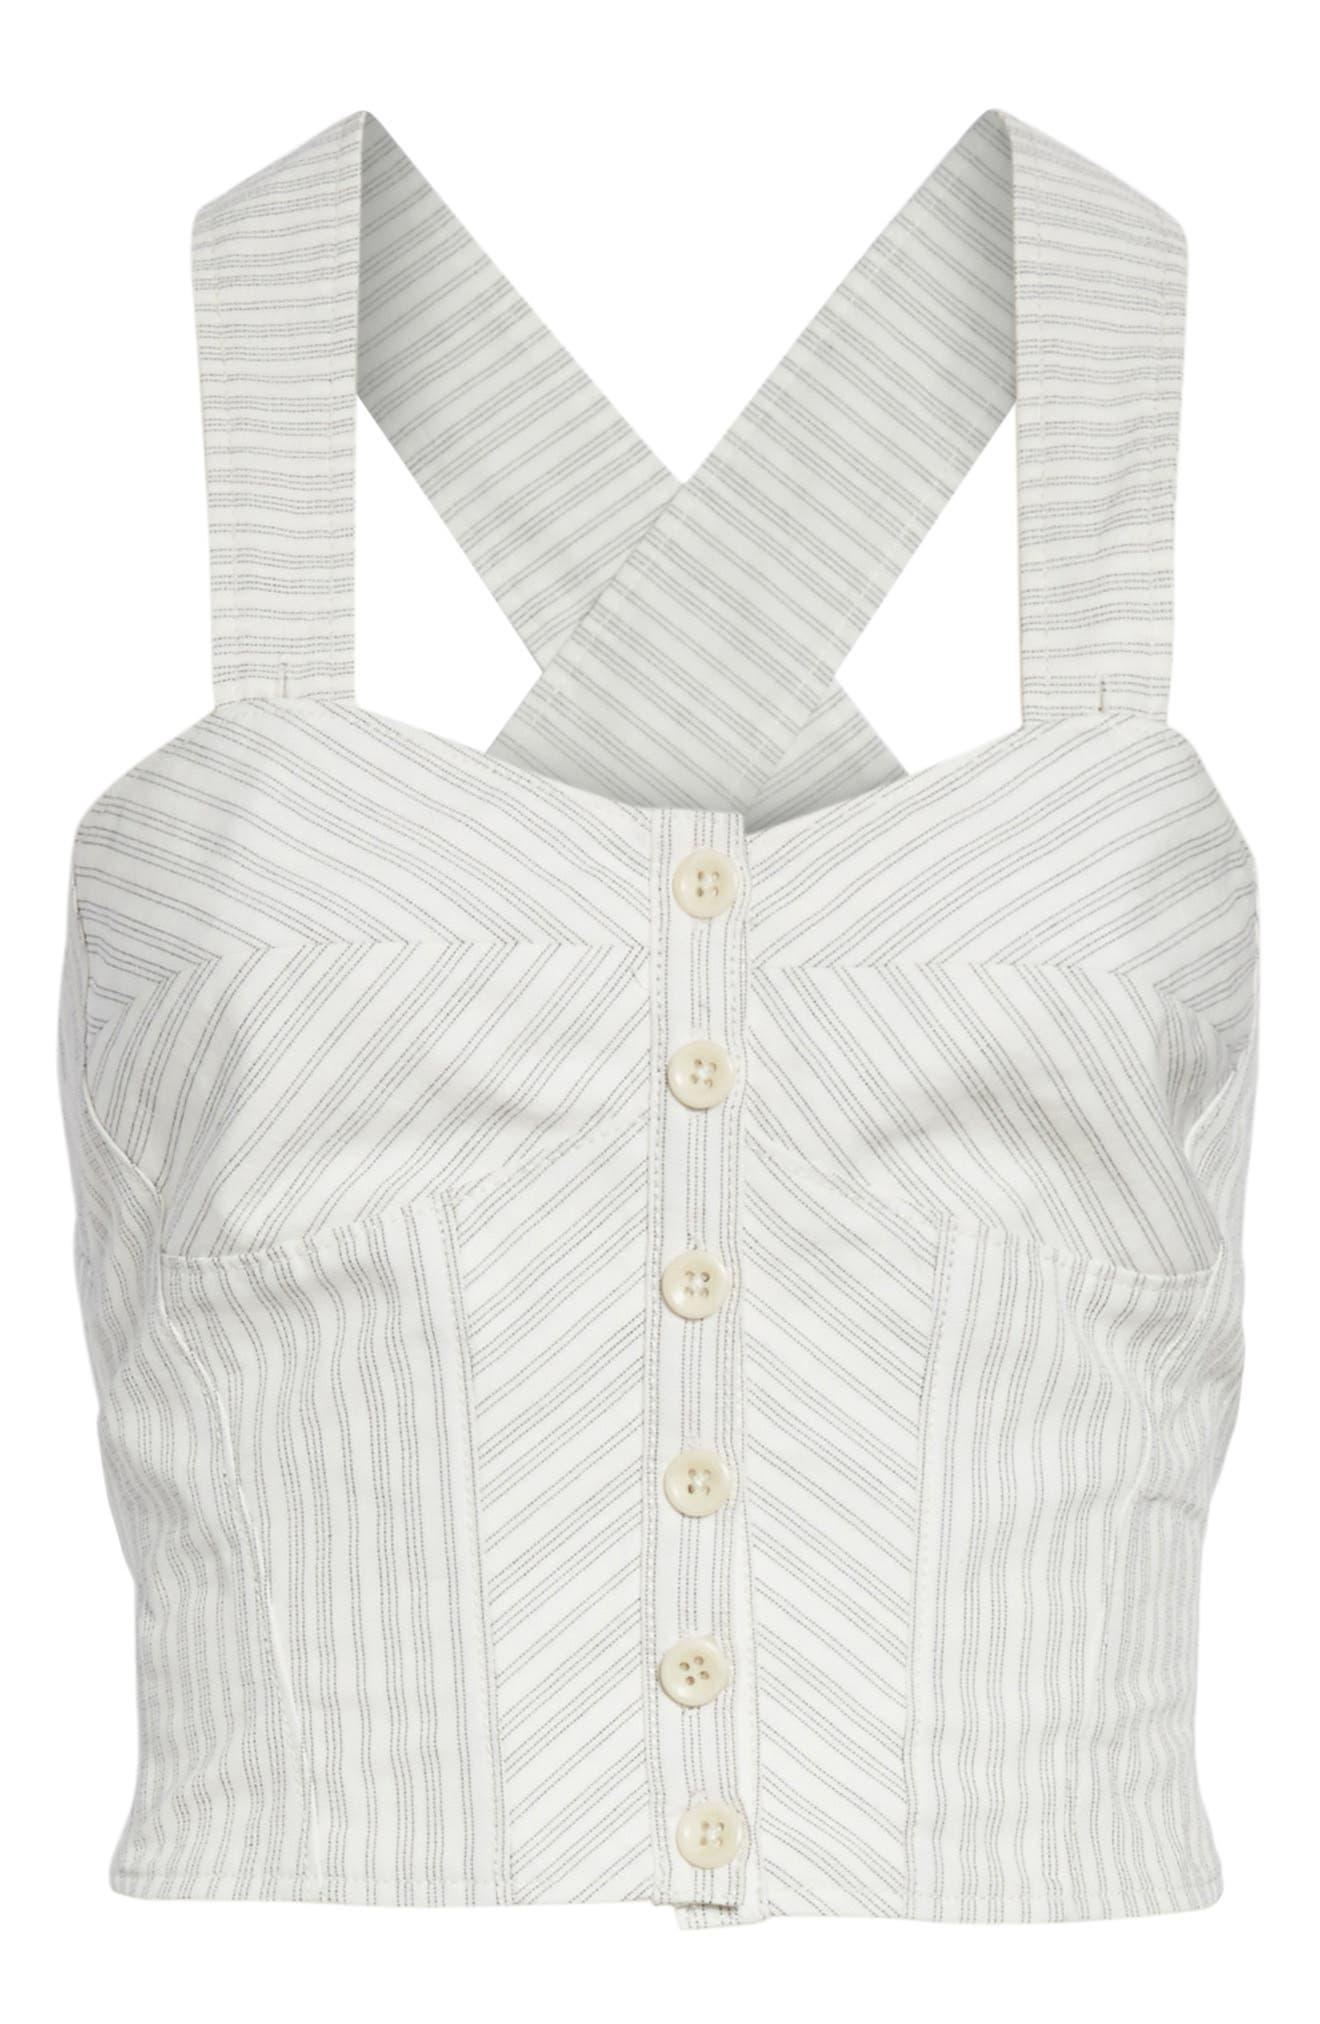 REBECCA TAYLOR,                             Crisscross Back Stripe Cotton Linen Top,                             Alternate thumbnail 6, color,                             199